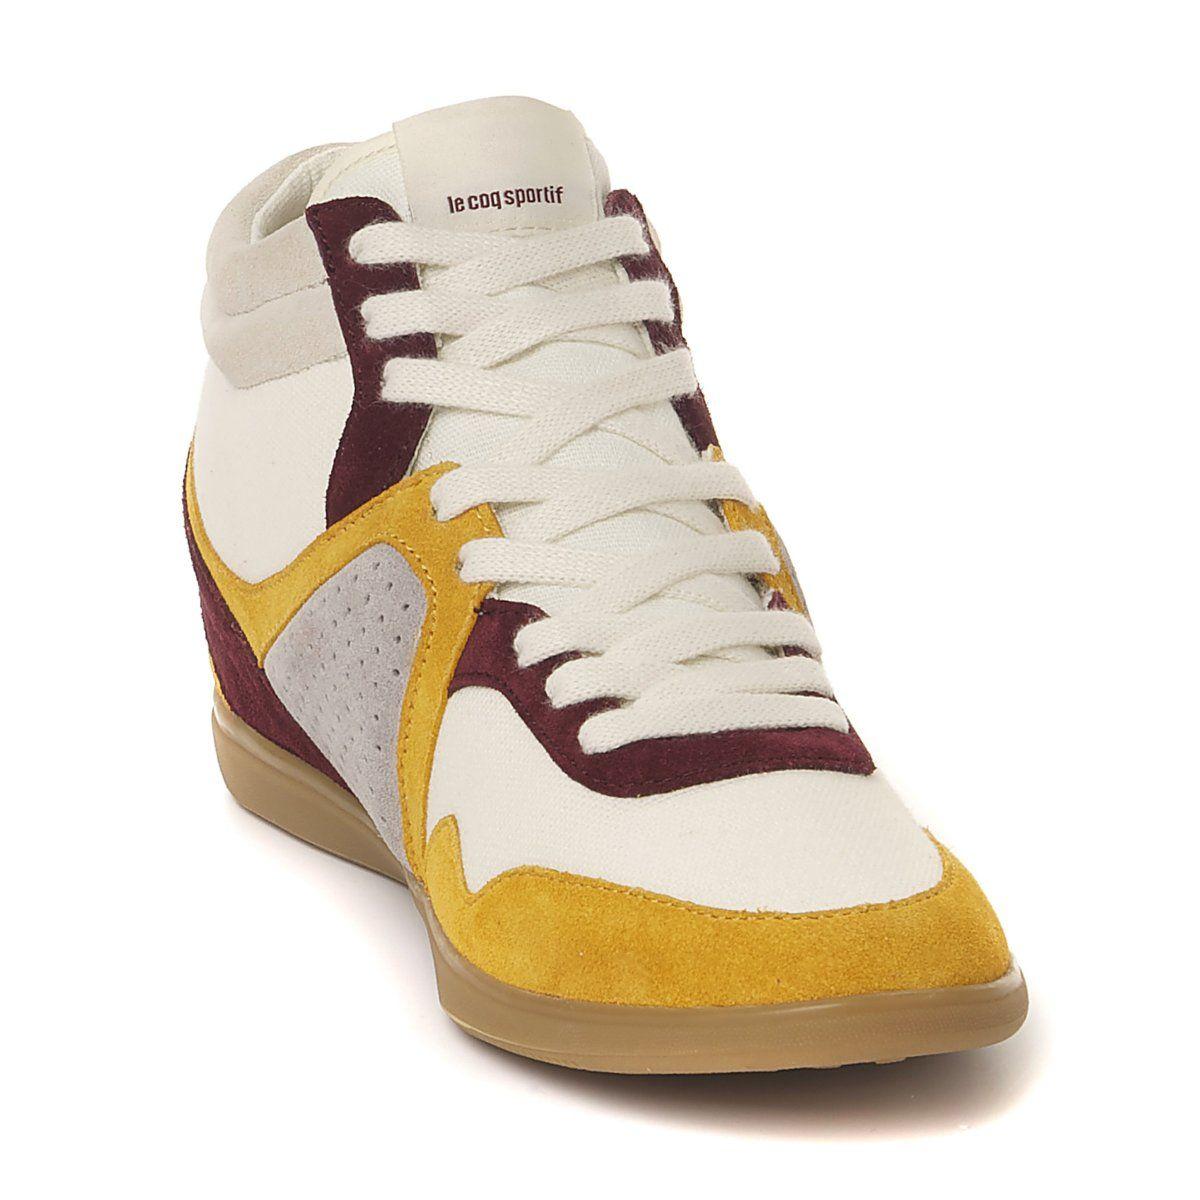 73e63c74c0c8 Le Coq Sportif Leather Sneakers - Available on La Redoute.com ...